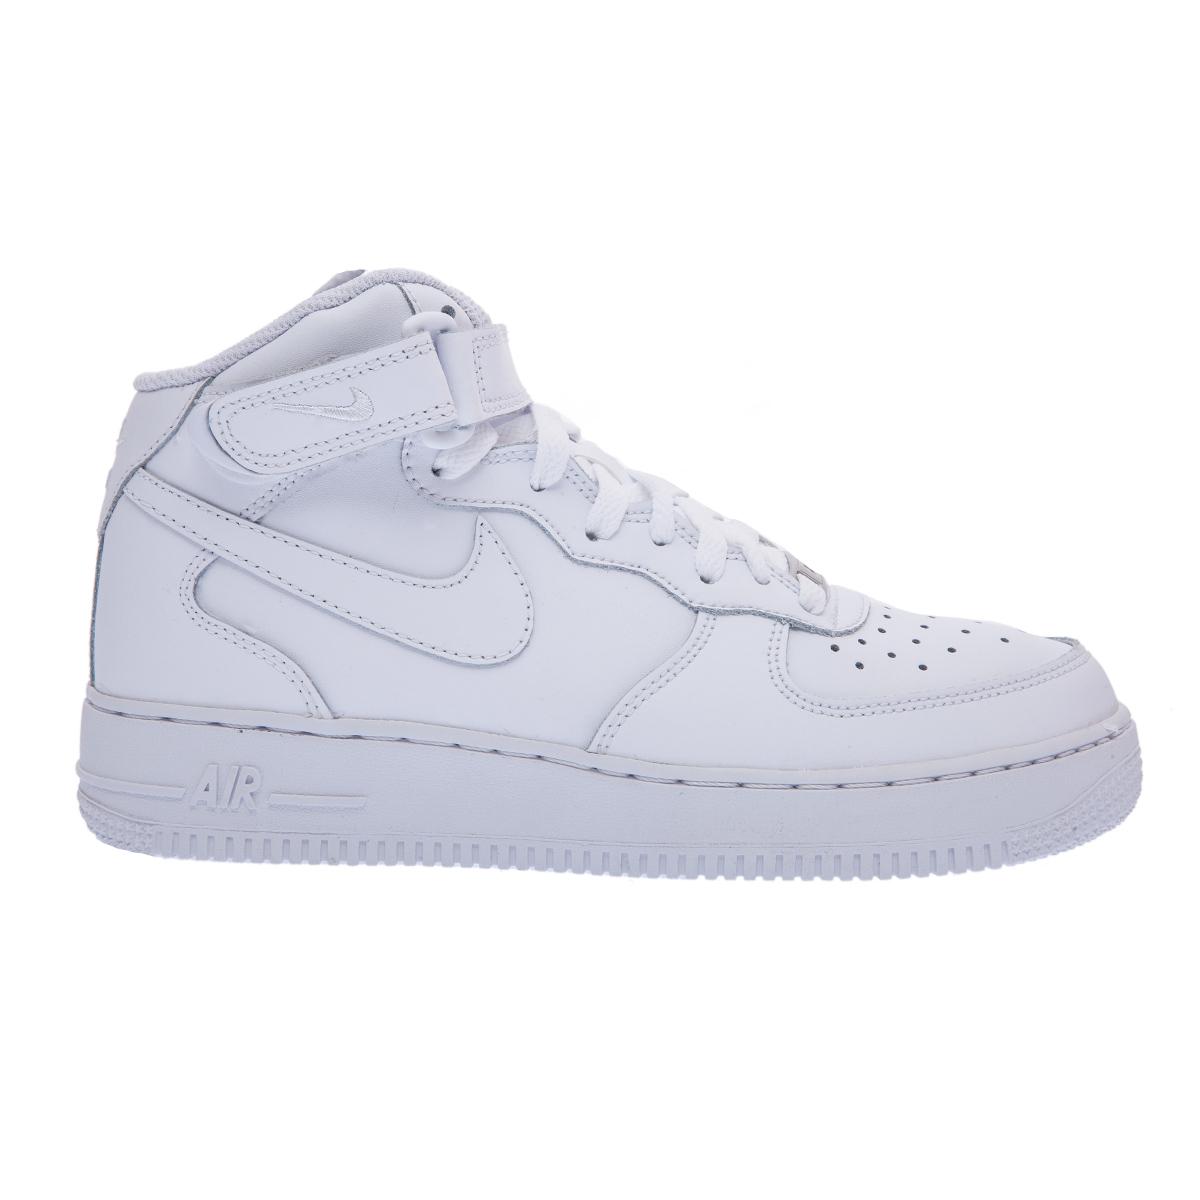 9ac880396bd NIKE – Παιδικά παπούτσια NIKE AIR FORCE 1 MID λευκά Παιδικά/Boys/Παπούτσια/